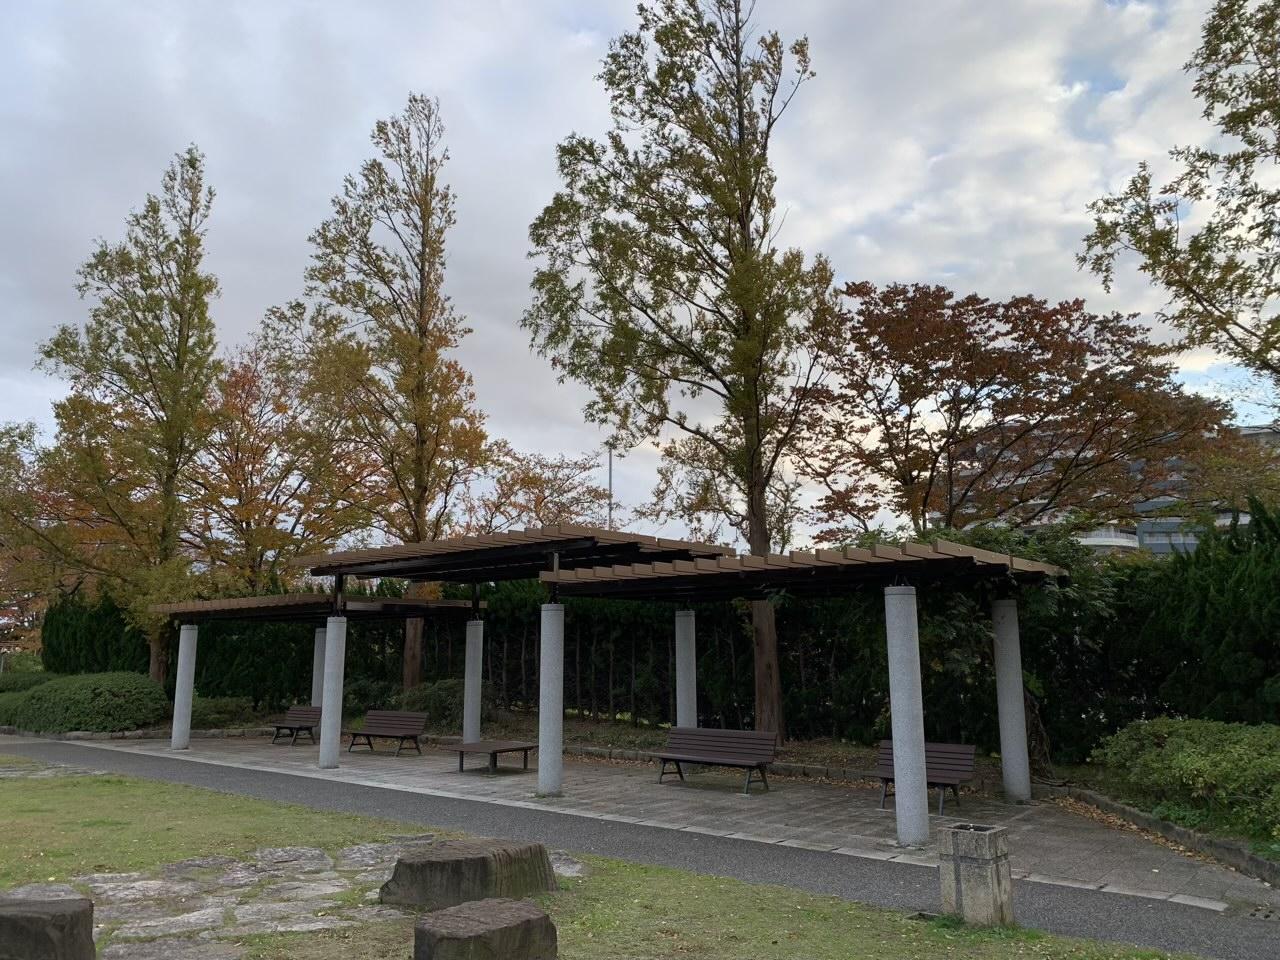 新潟県立鳥屋野潟公園|鐘木地区 ベンチ